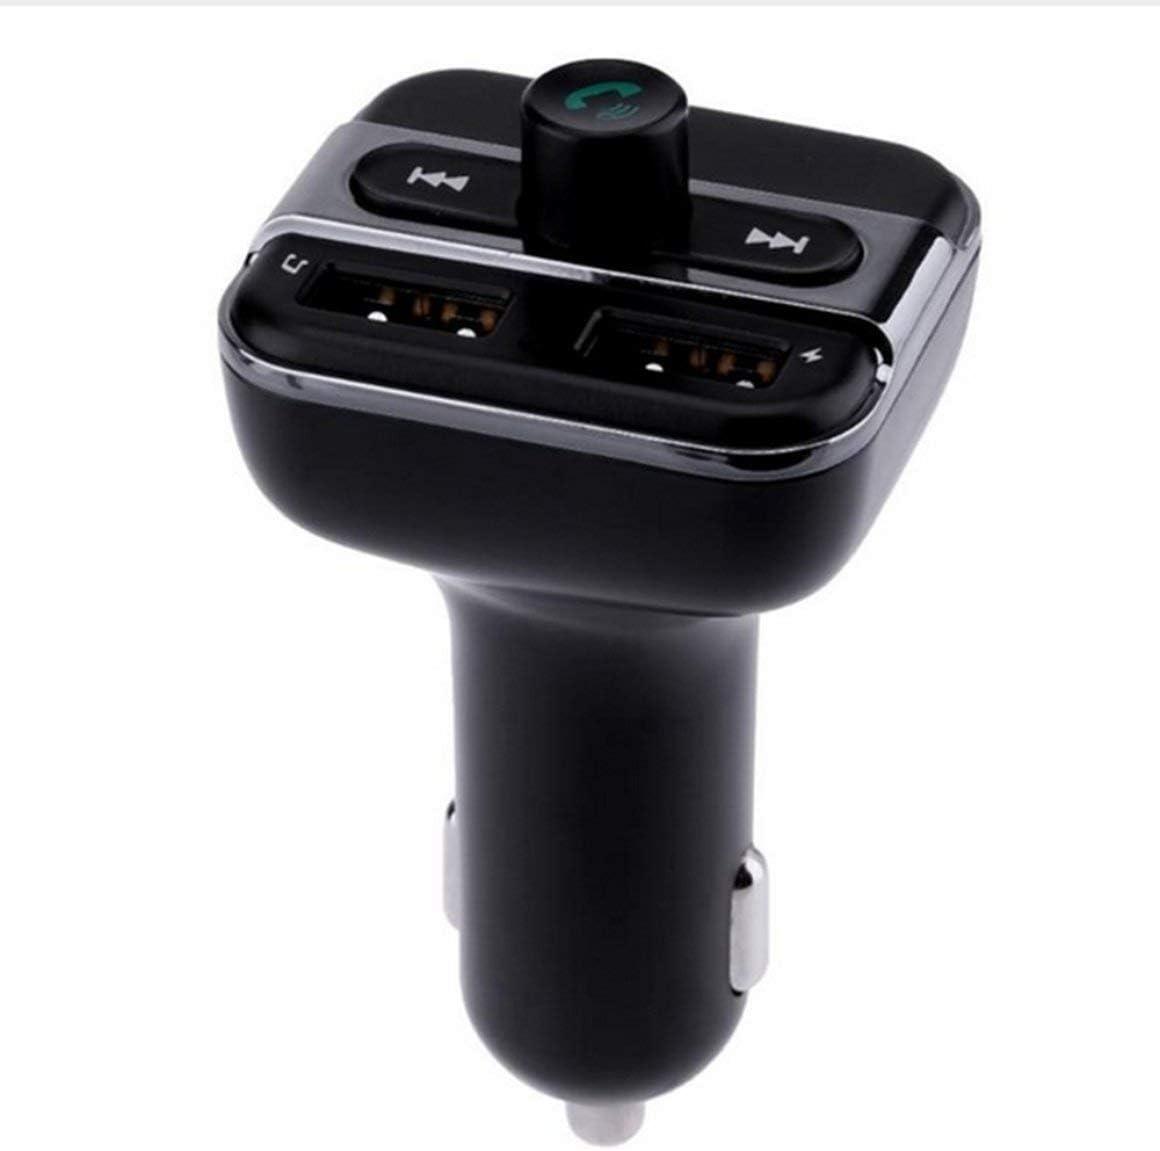 BT20 Manos Libres para automóvil transmisor FM Dual USB 3.4A Cargador para automóvil TF Manos Libres para automóvil